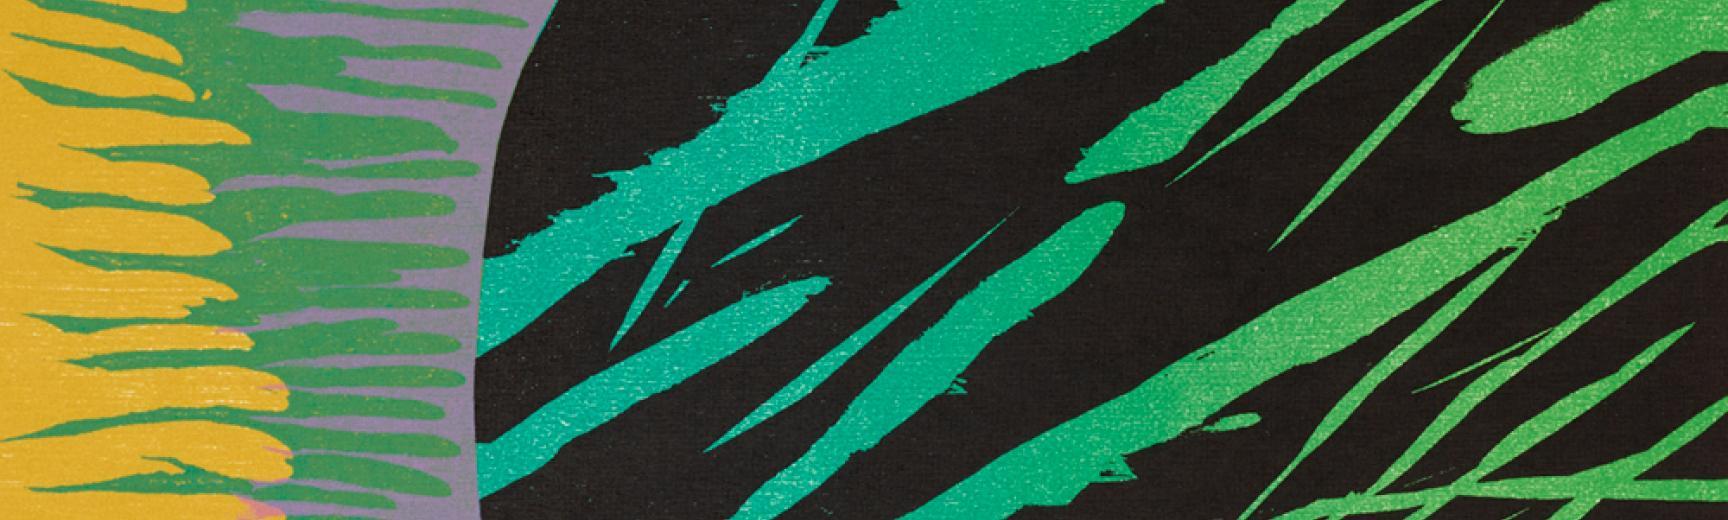 Naoko Matsubara – Dark Undercurrents, a colour woodblock print